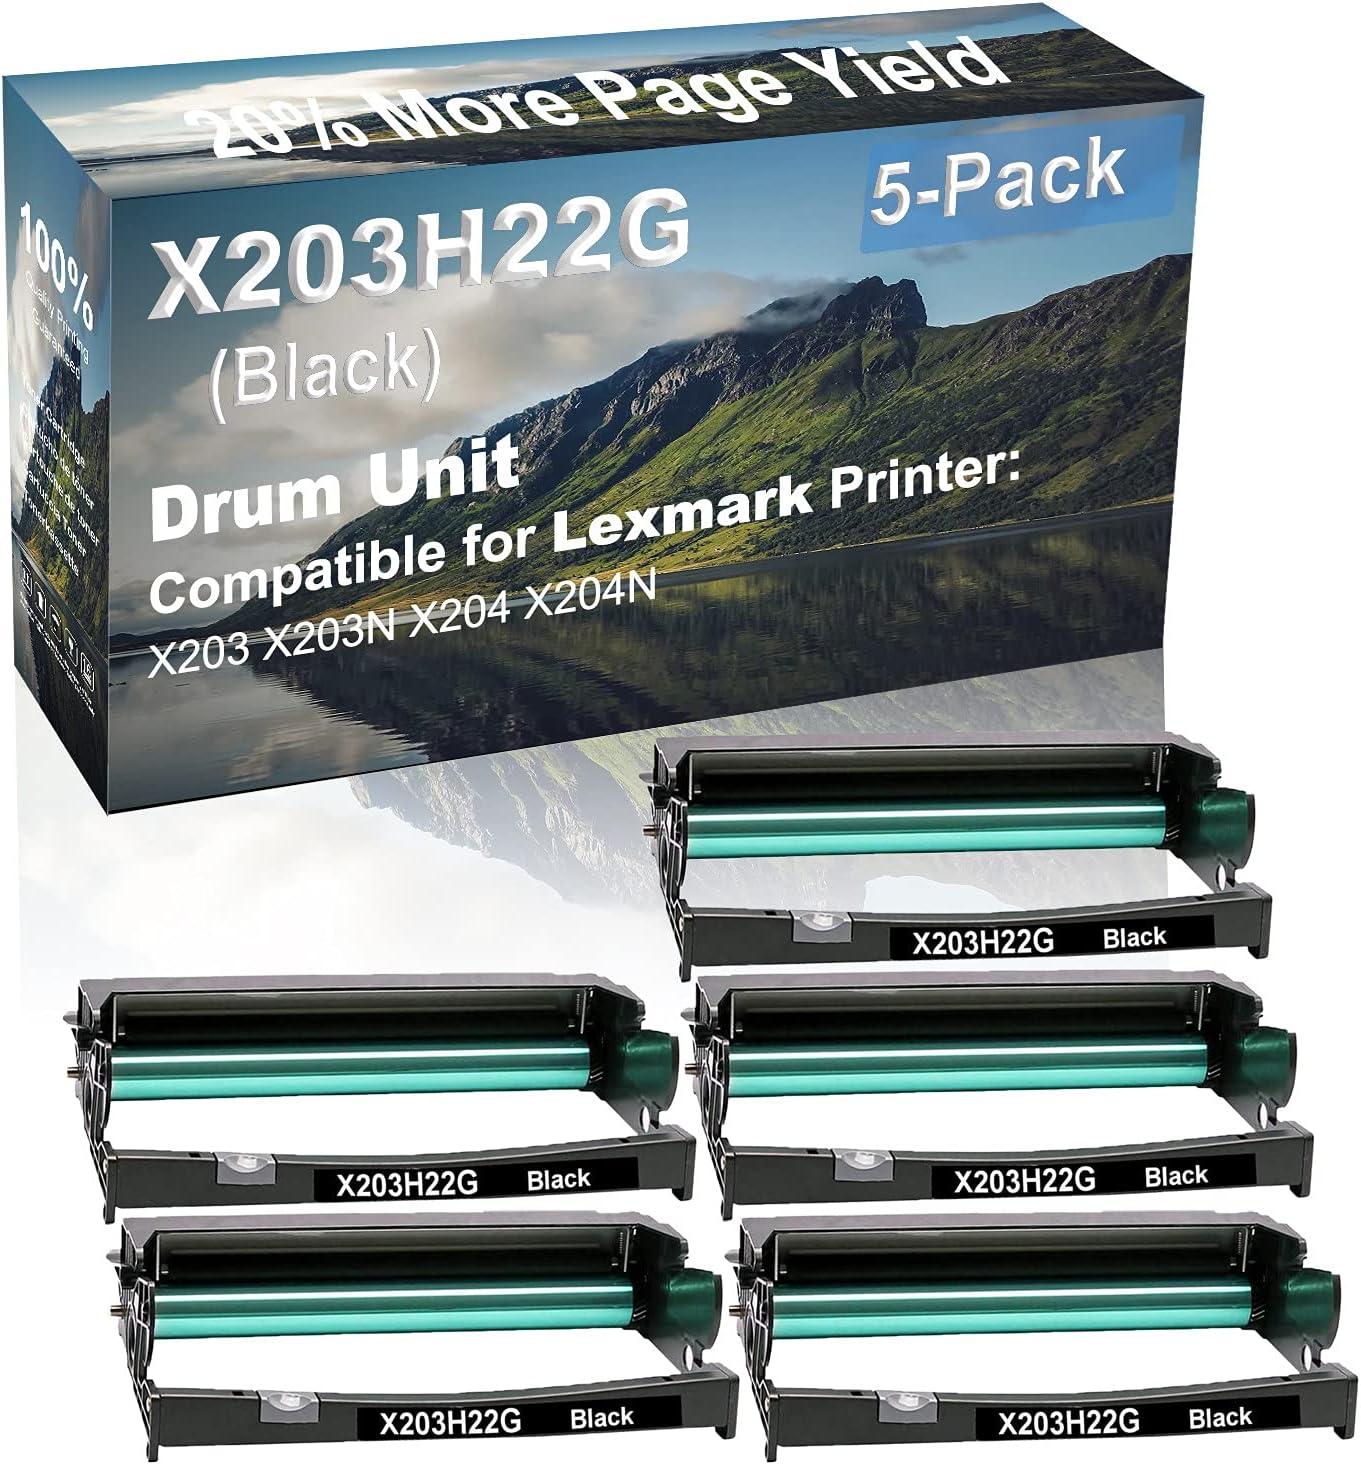 5-Pack Compatible Drum Unit (Black) Replacement for Lexmark X203H22G Drum Kit use for Lexmark X203 X203N X204 X204N Printer